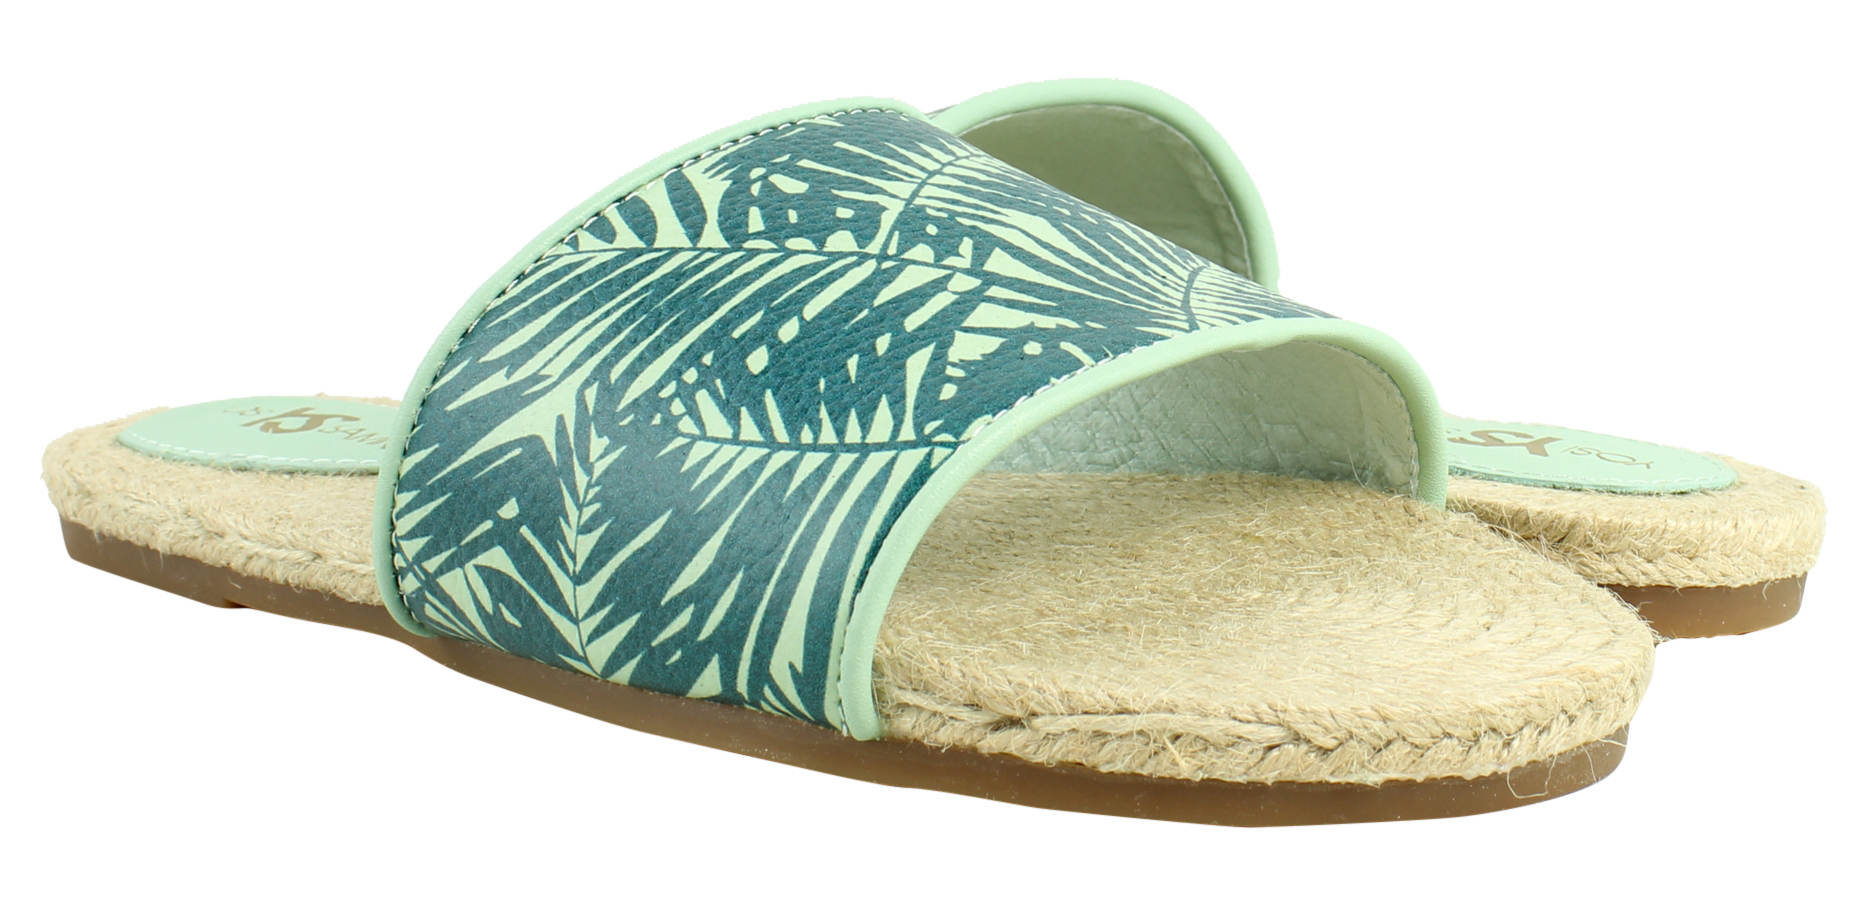 Yosi Samra Womens Sage/Pine Slide Sandals Size 5 New - Walmart.com